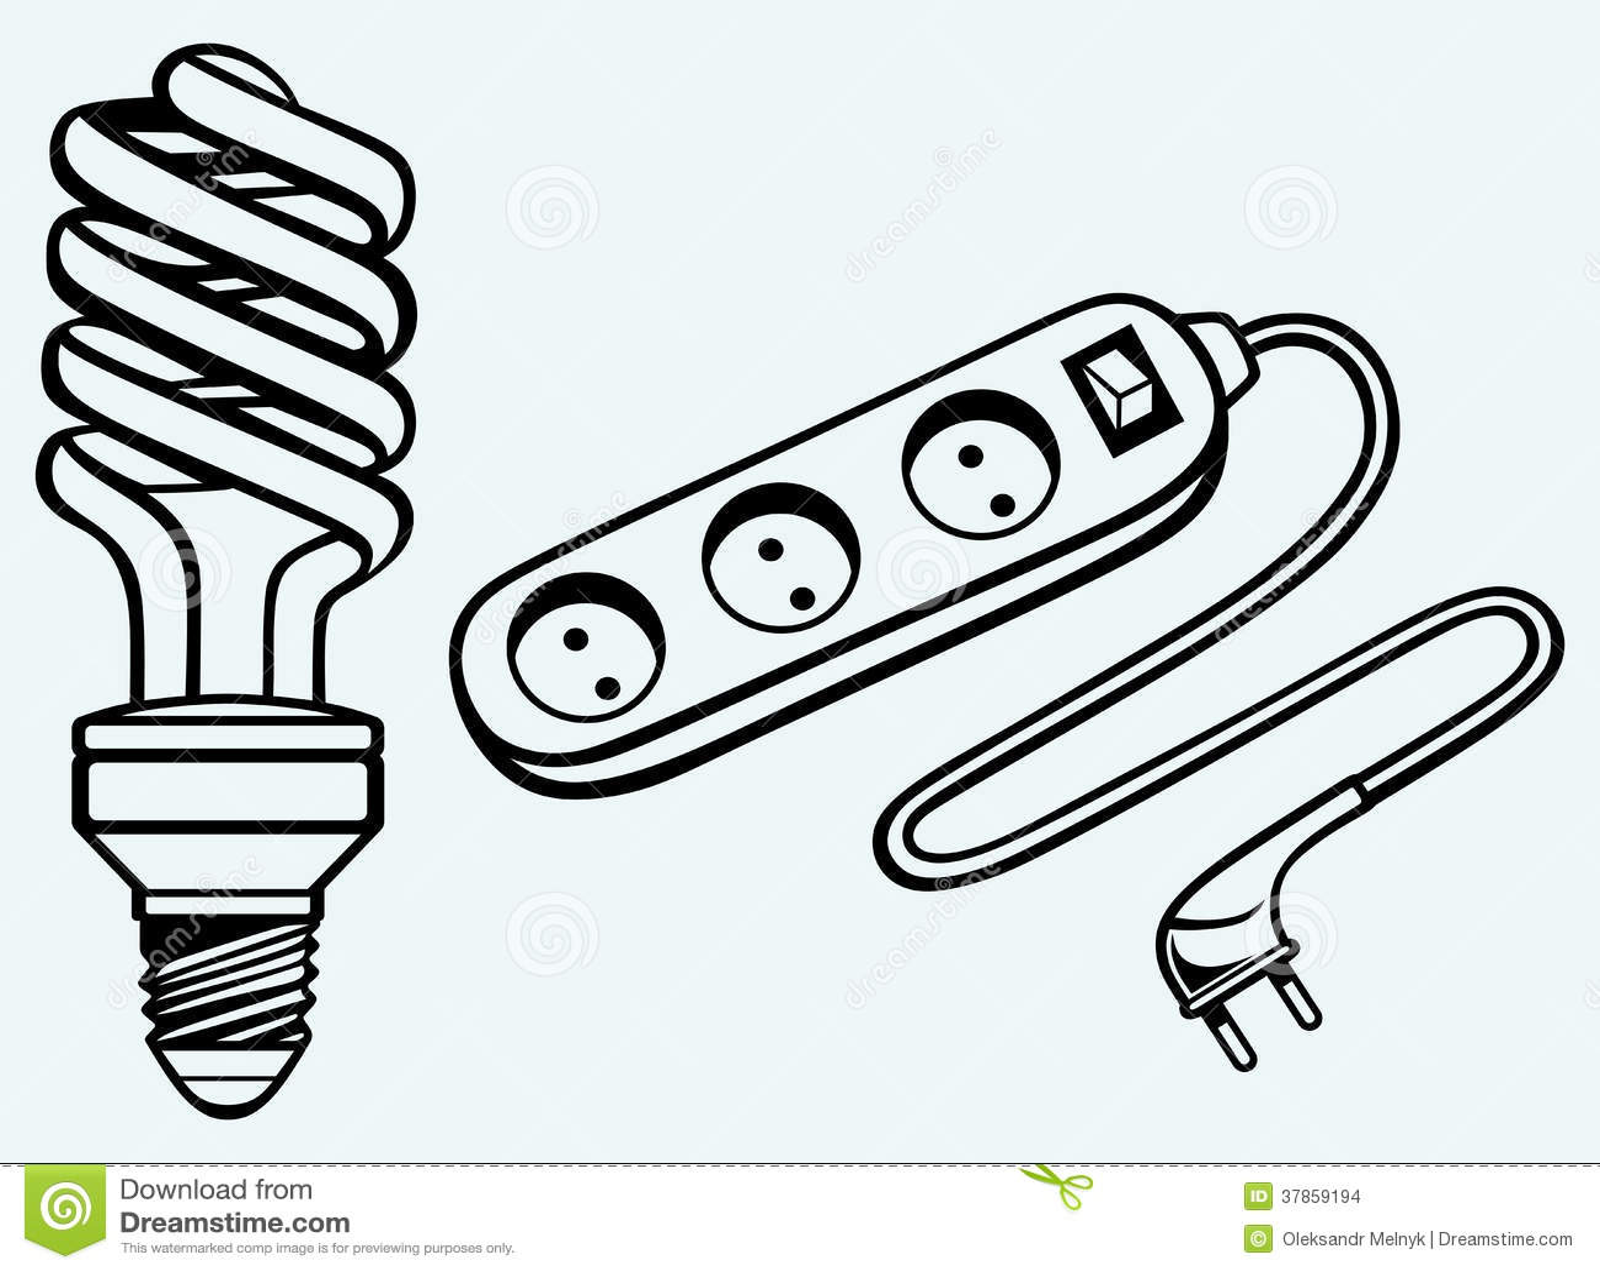 Energy Saving Light Bulb And Power Surge Stock Images